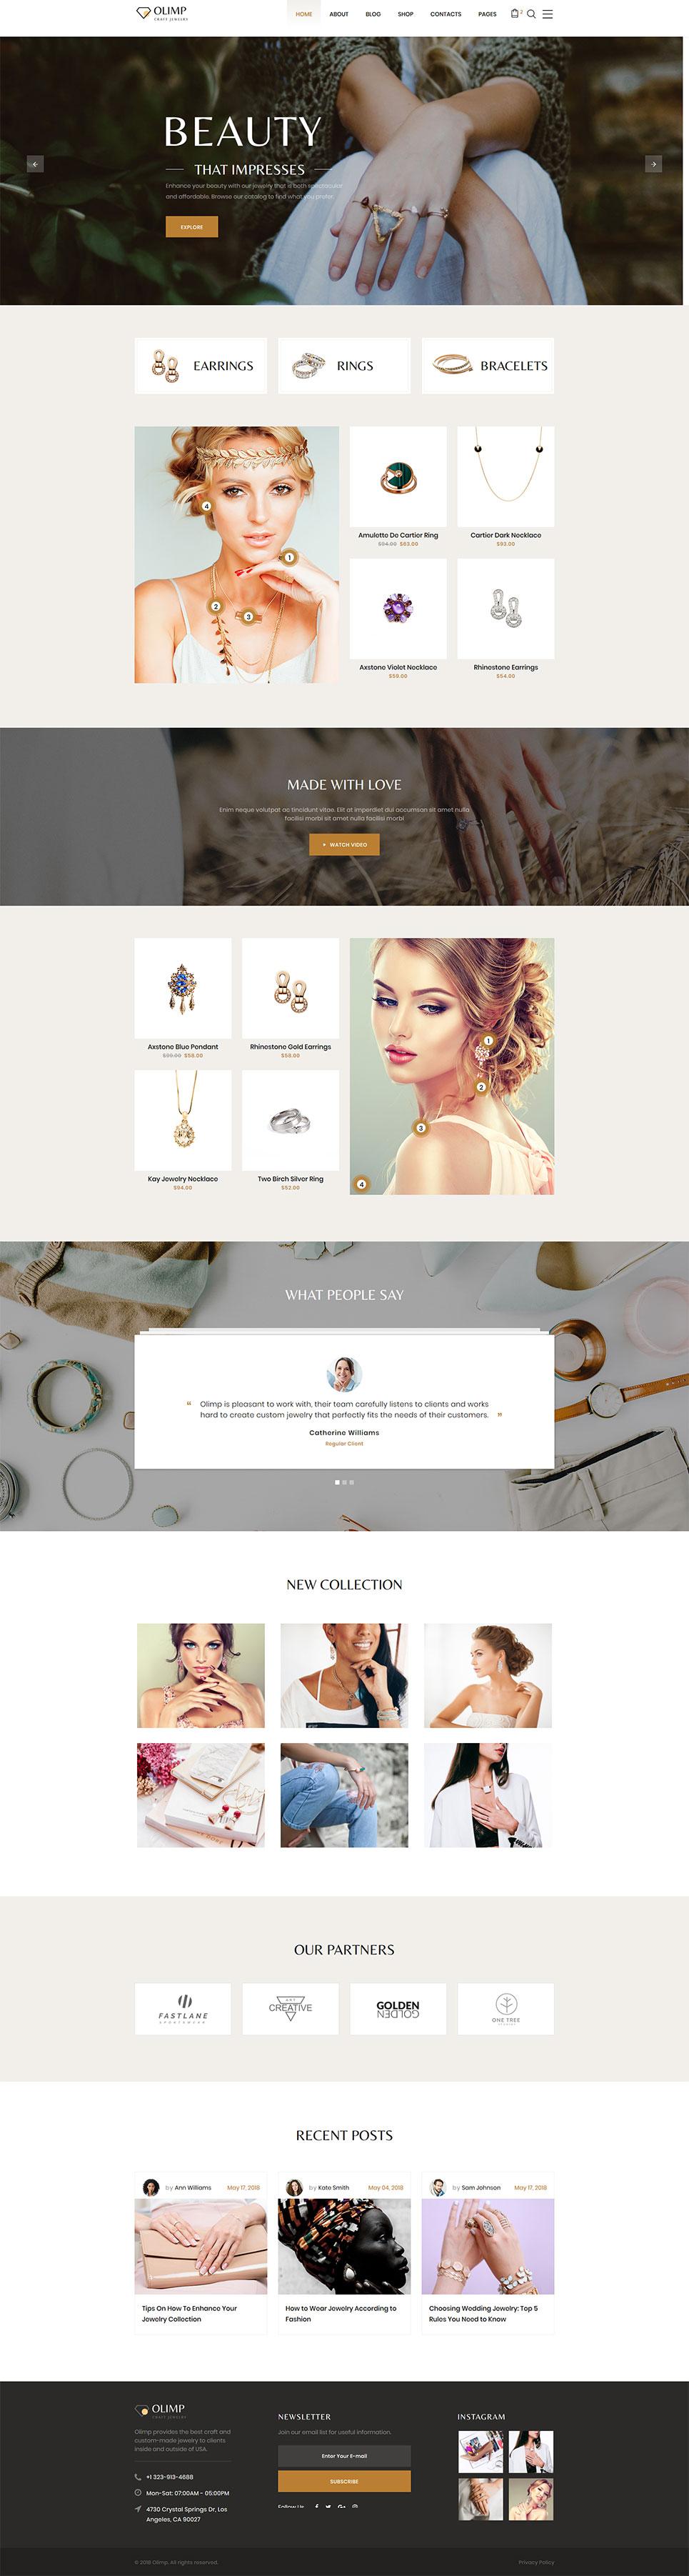 DiamondShop - Beautiful Jewelry Responsive template illustration image